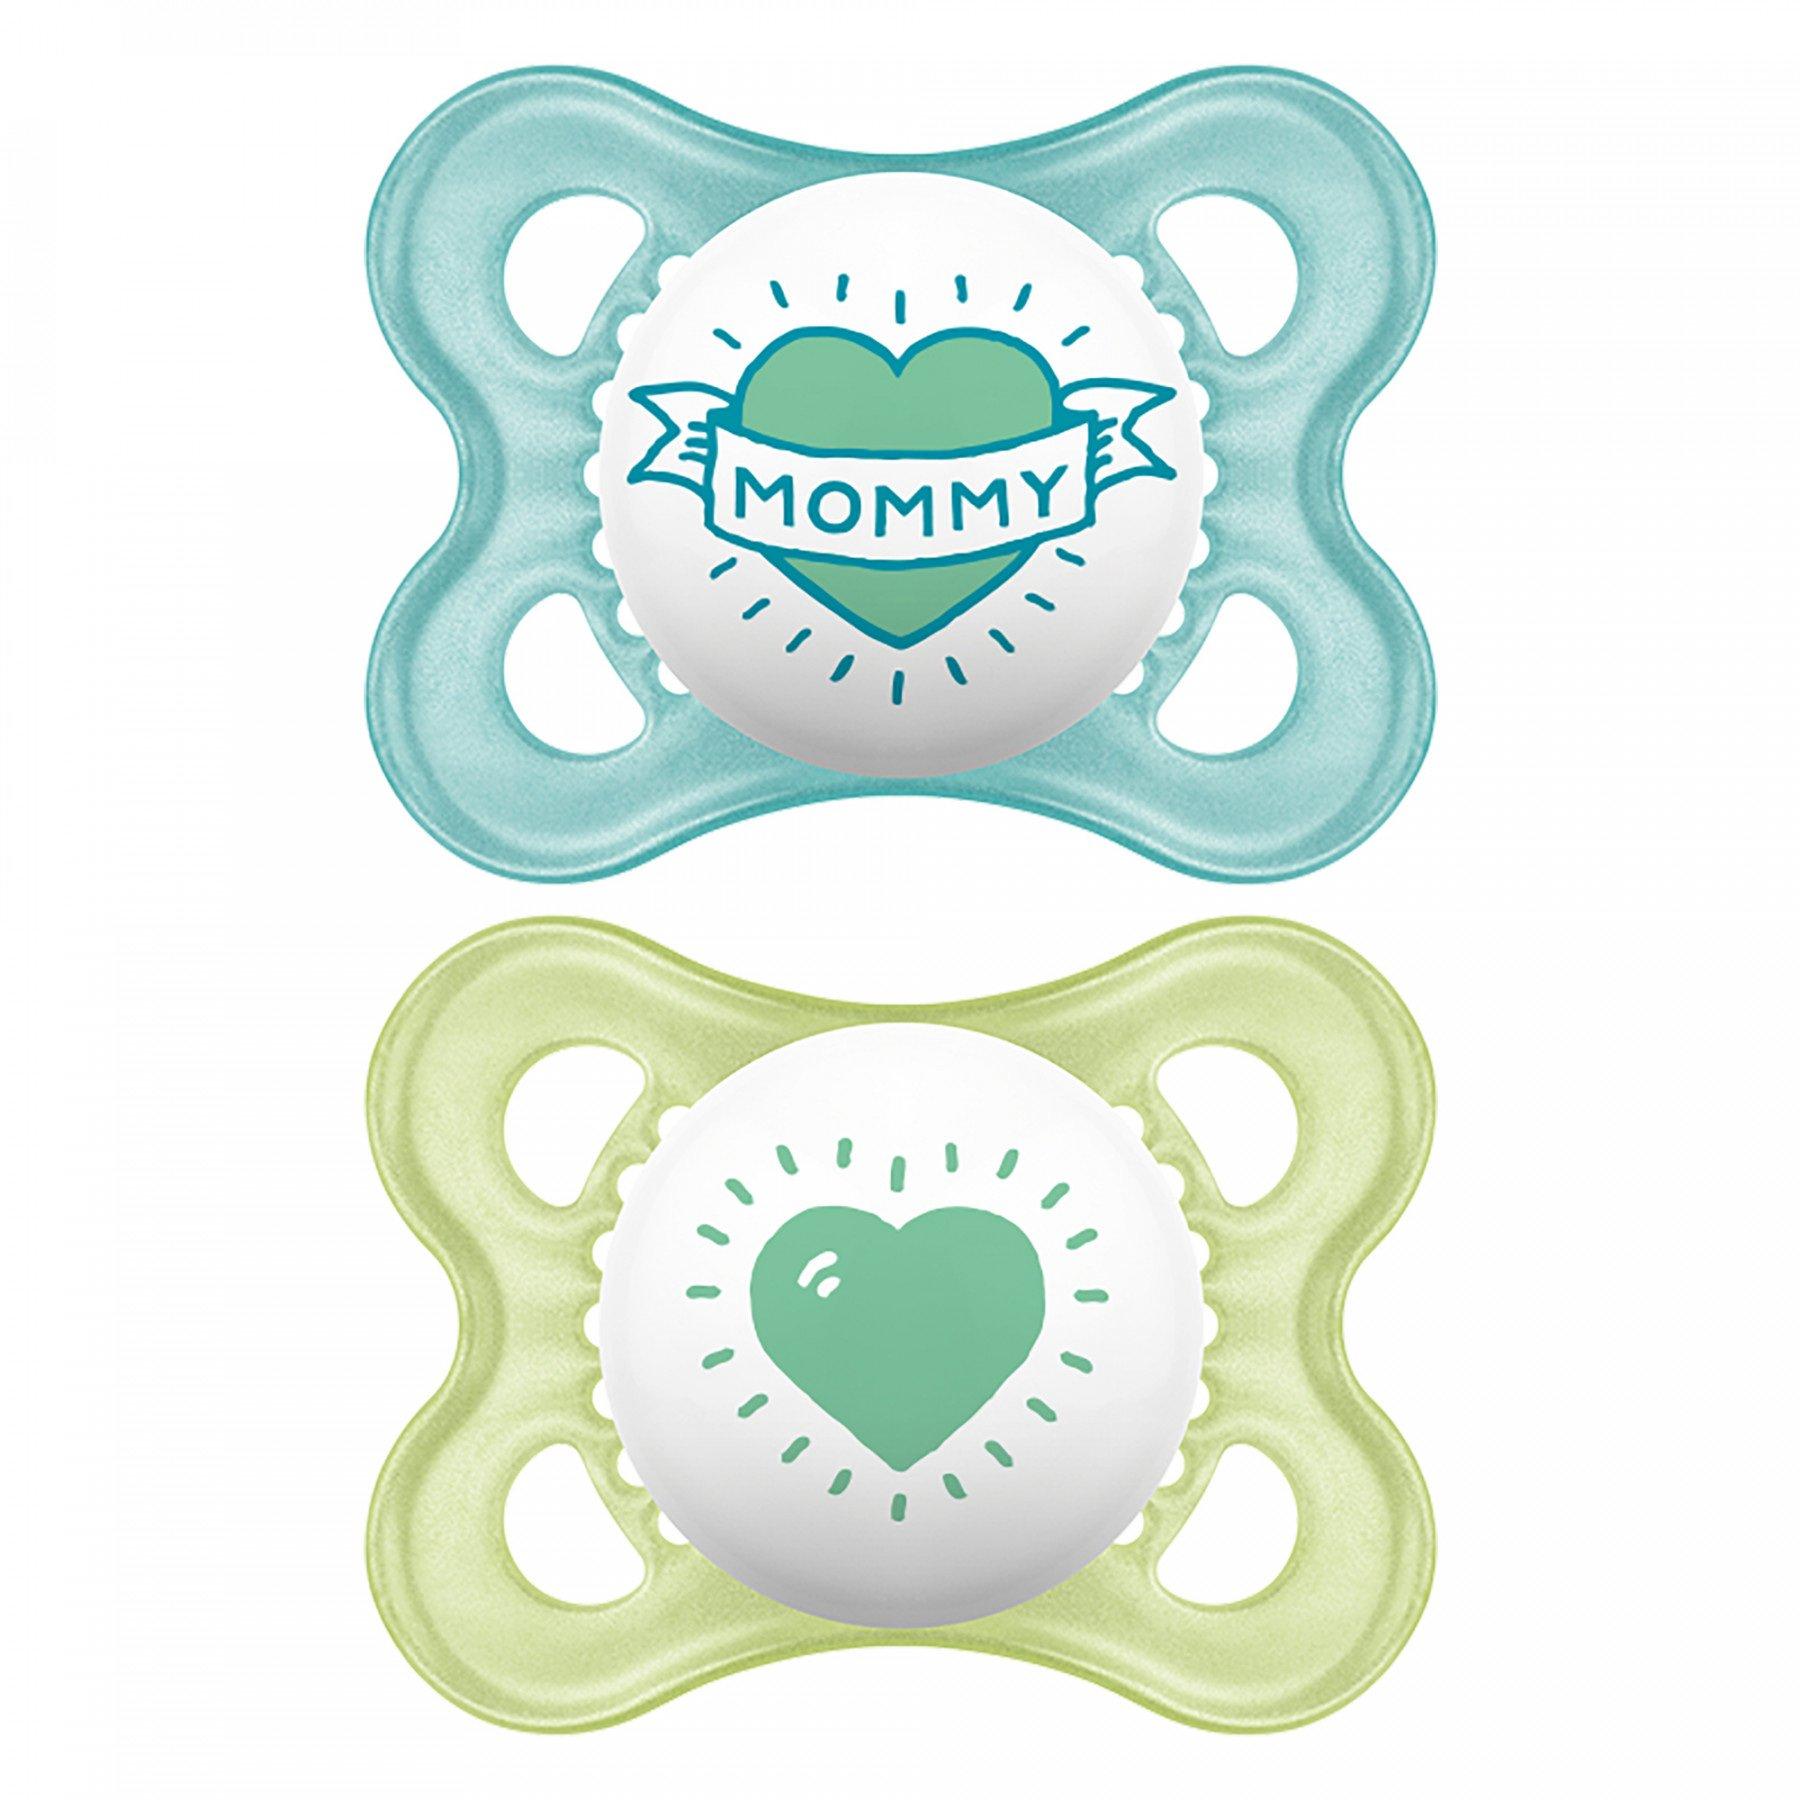 Mam I Love Mummy & Daddy Ορθοδοντική Πιπίλα Σιλικόνης Κωδ 115S από 2 Έως 6 Μηνών 2 Τεμάχια – γαλάζιο-πράσινο